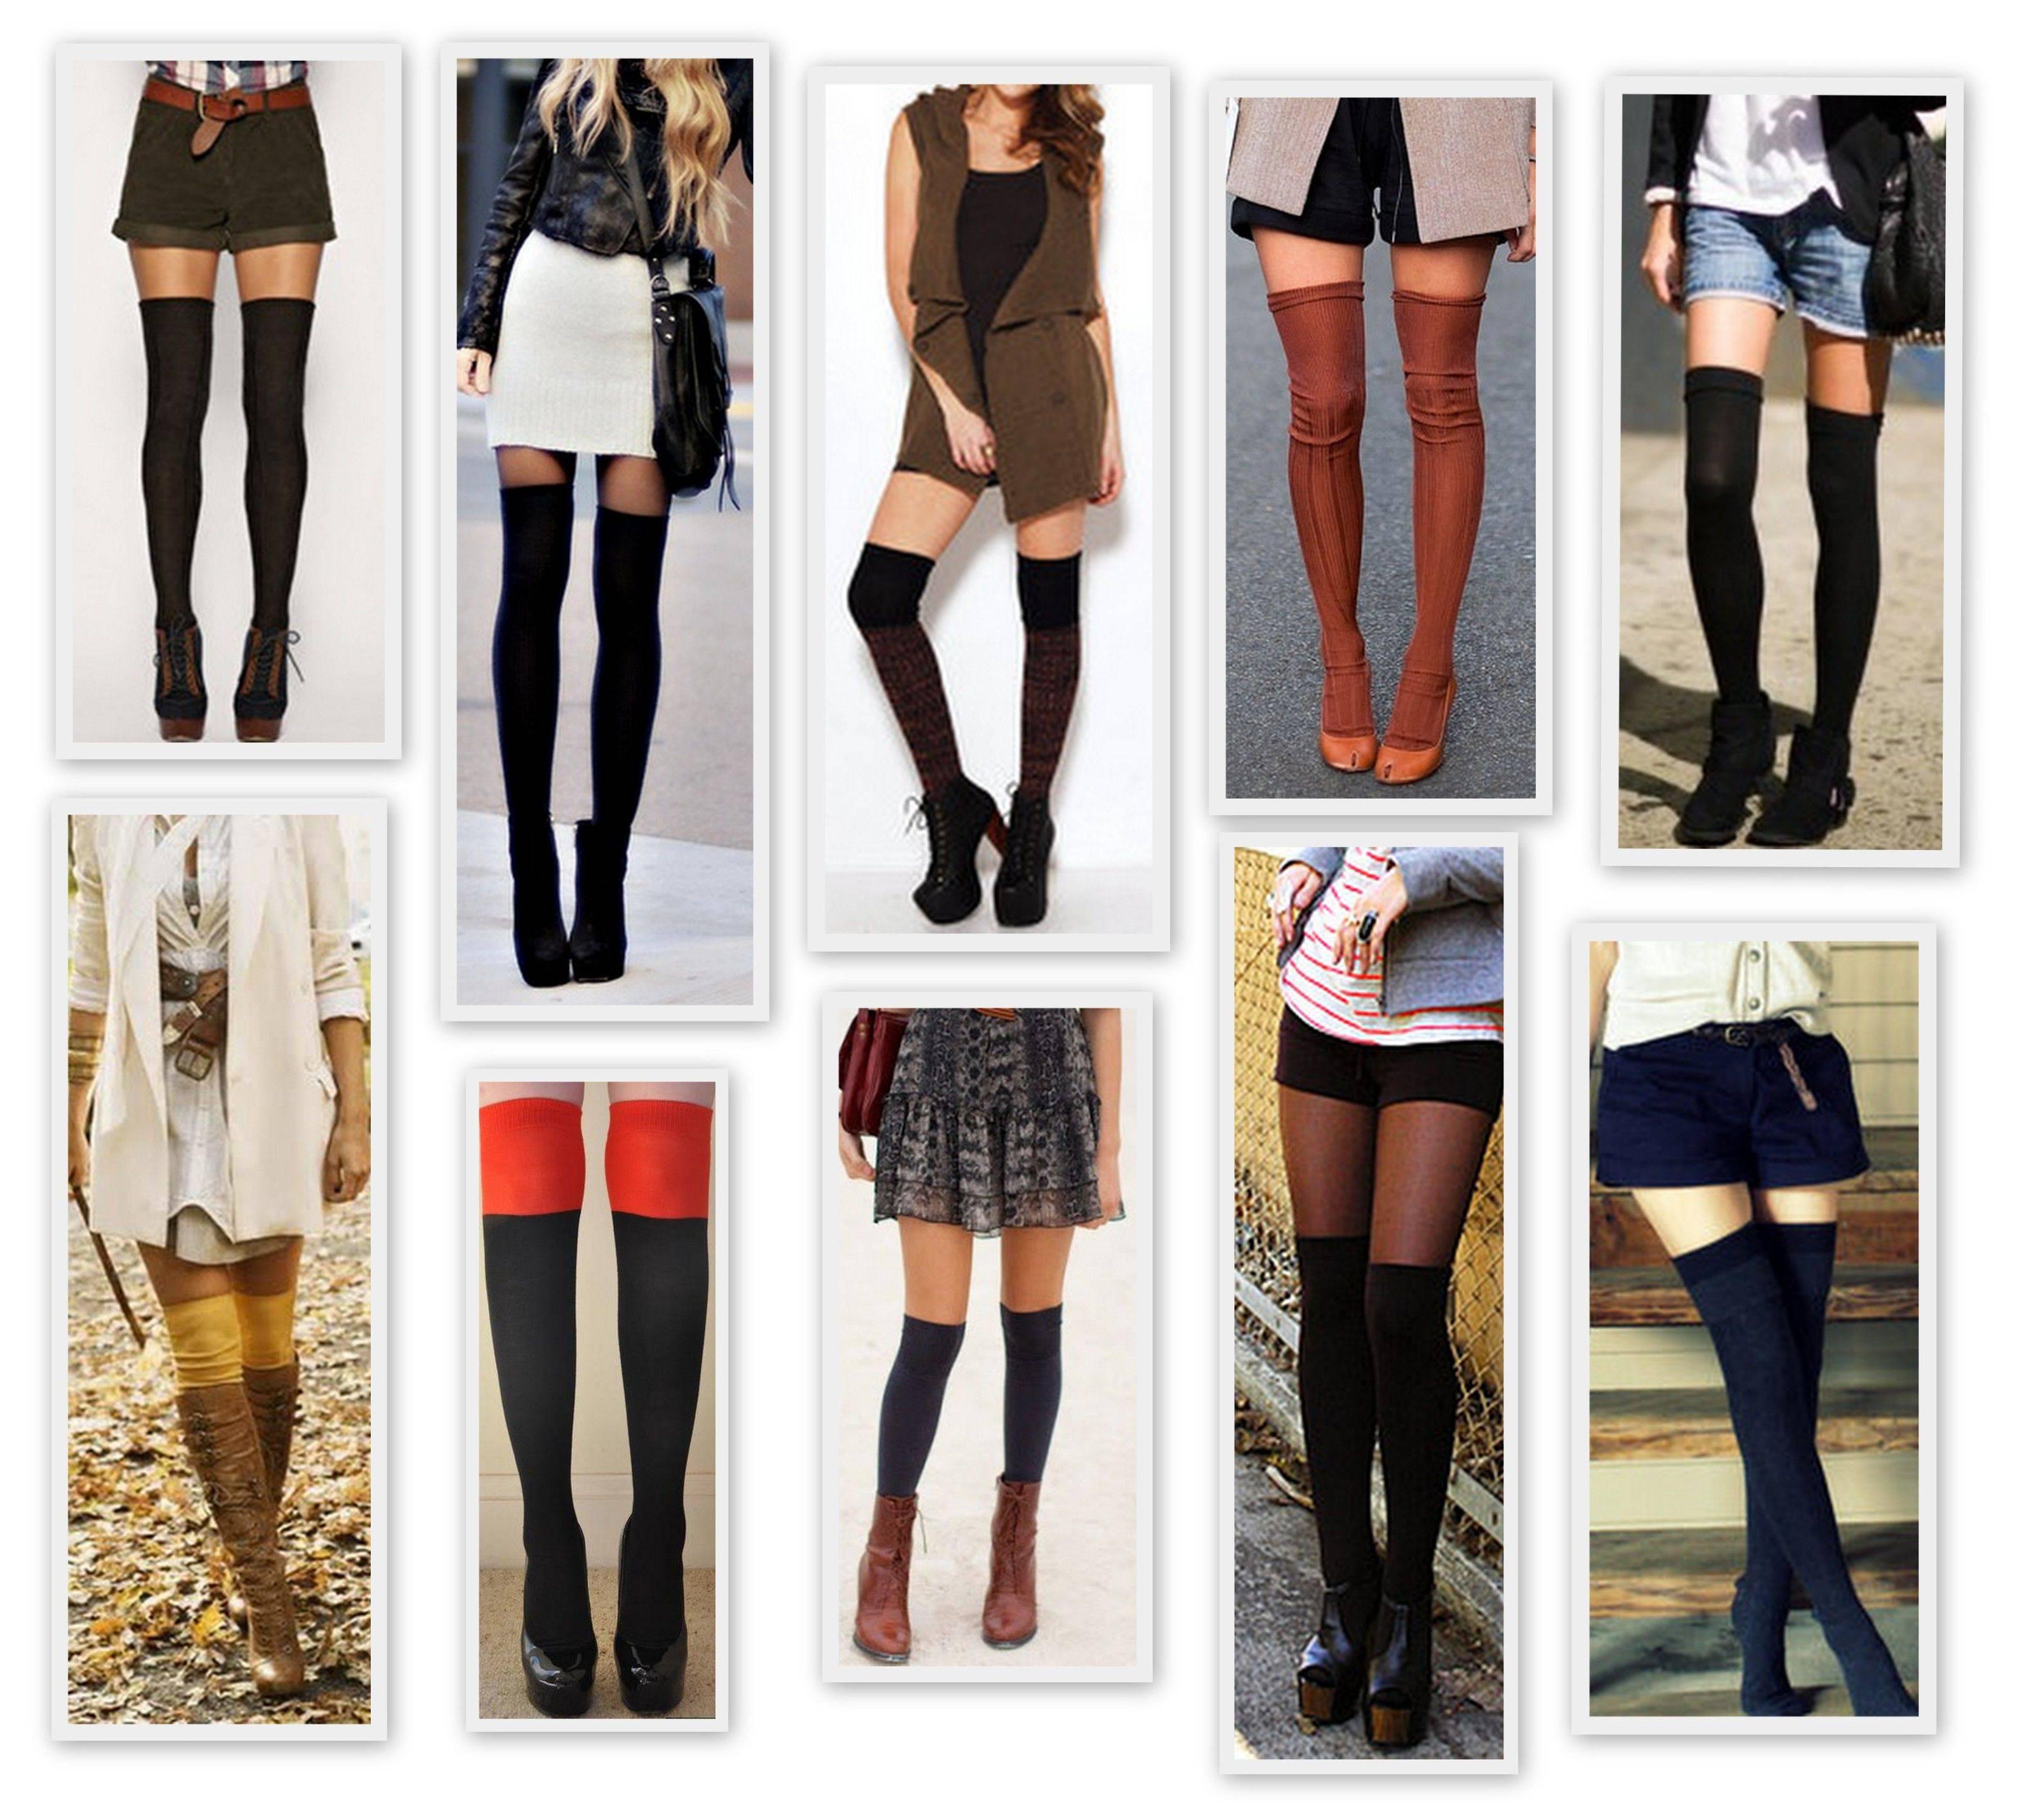 High thigh socks